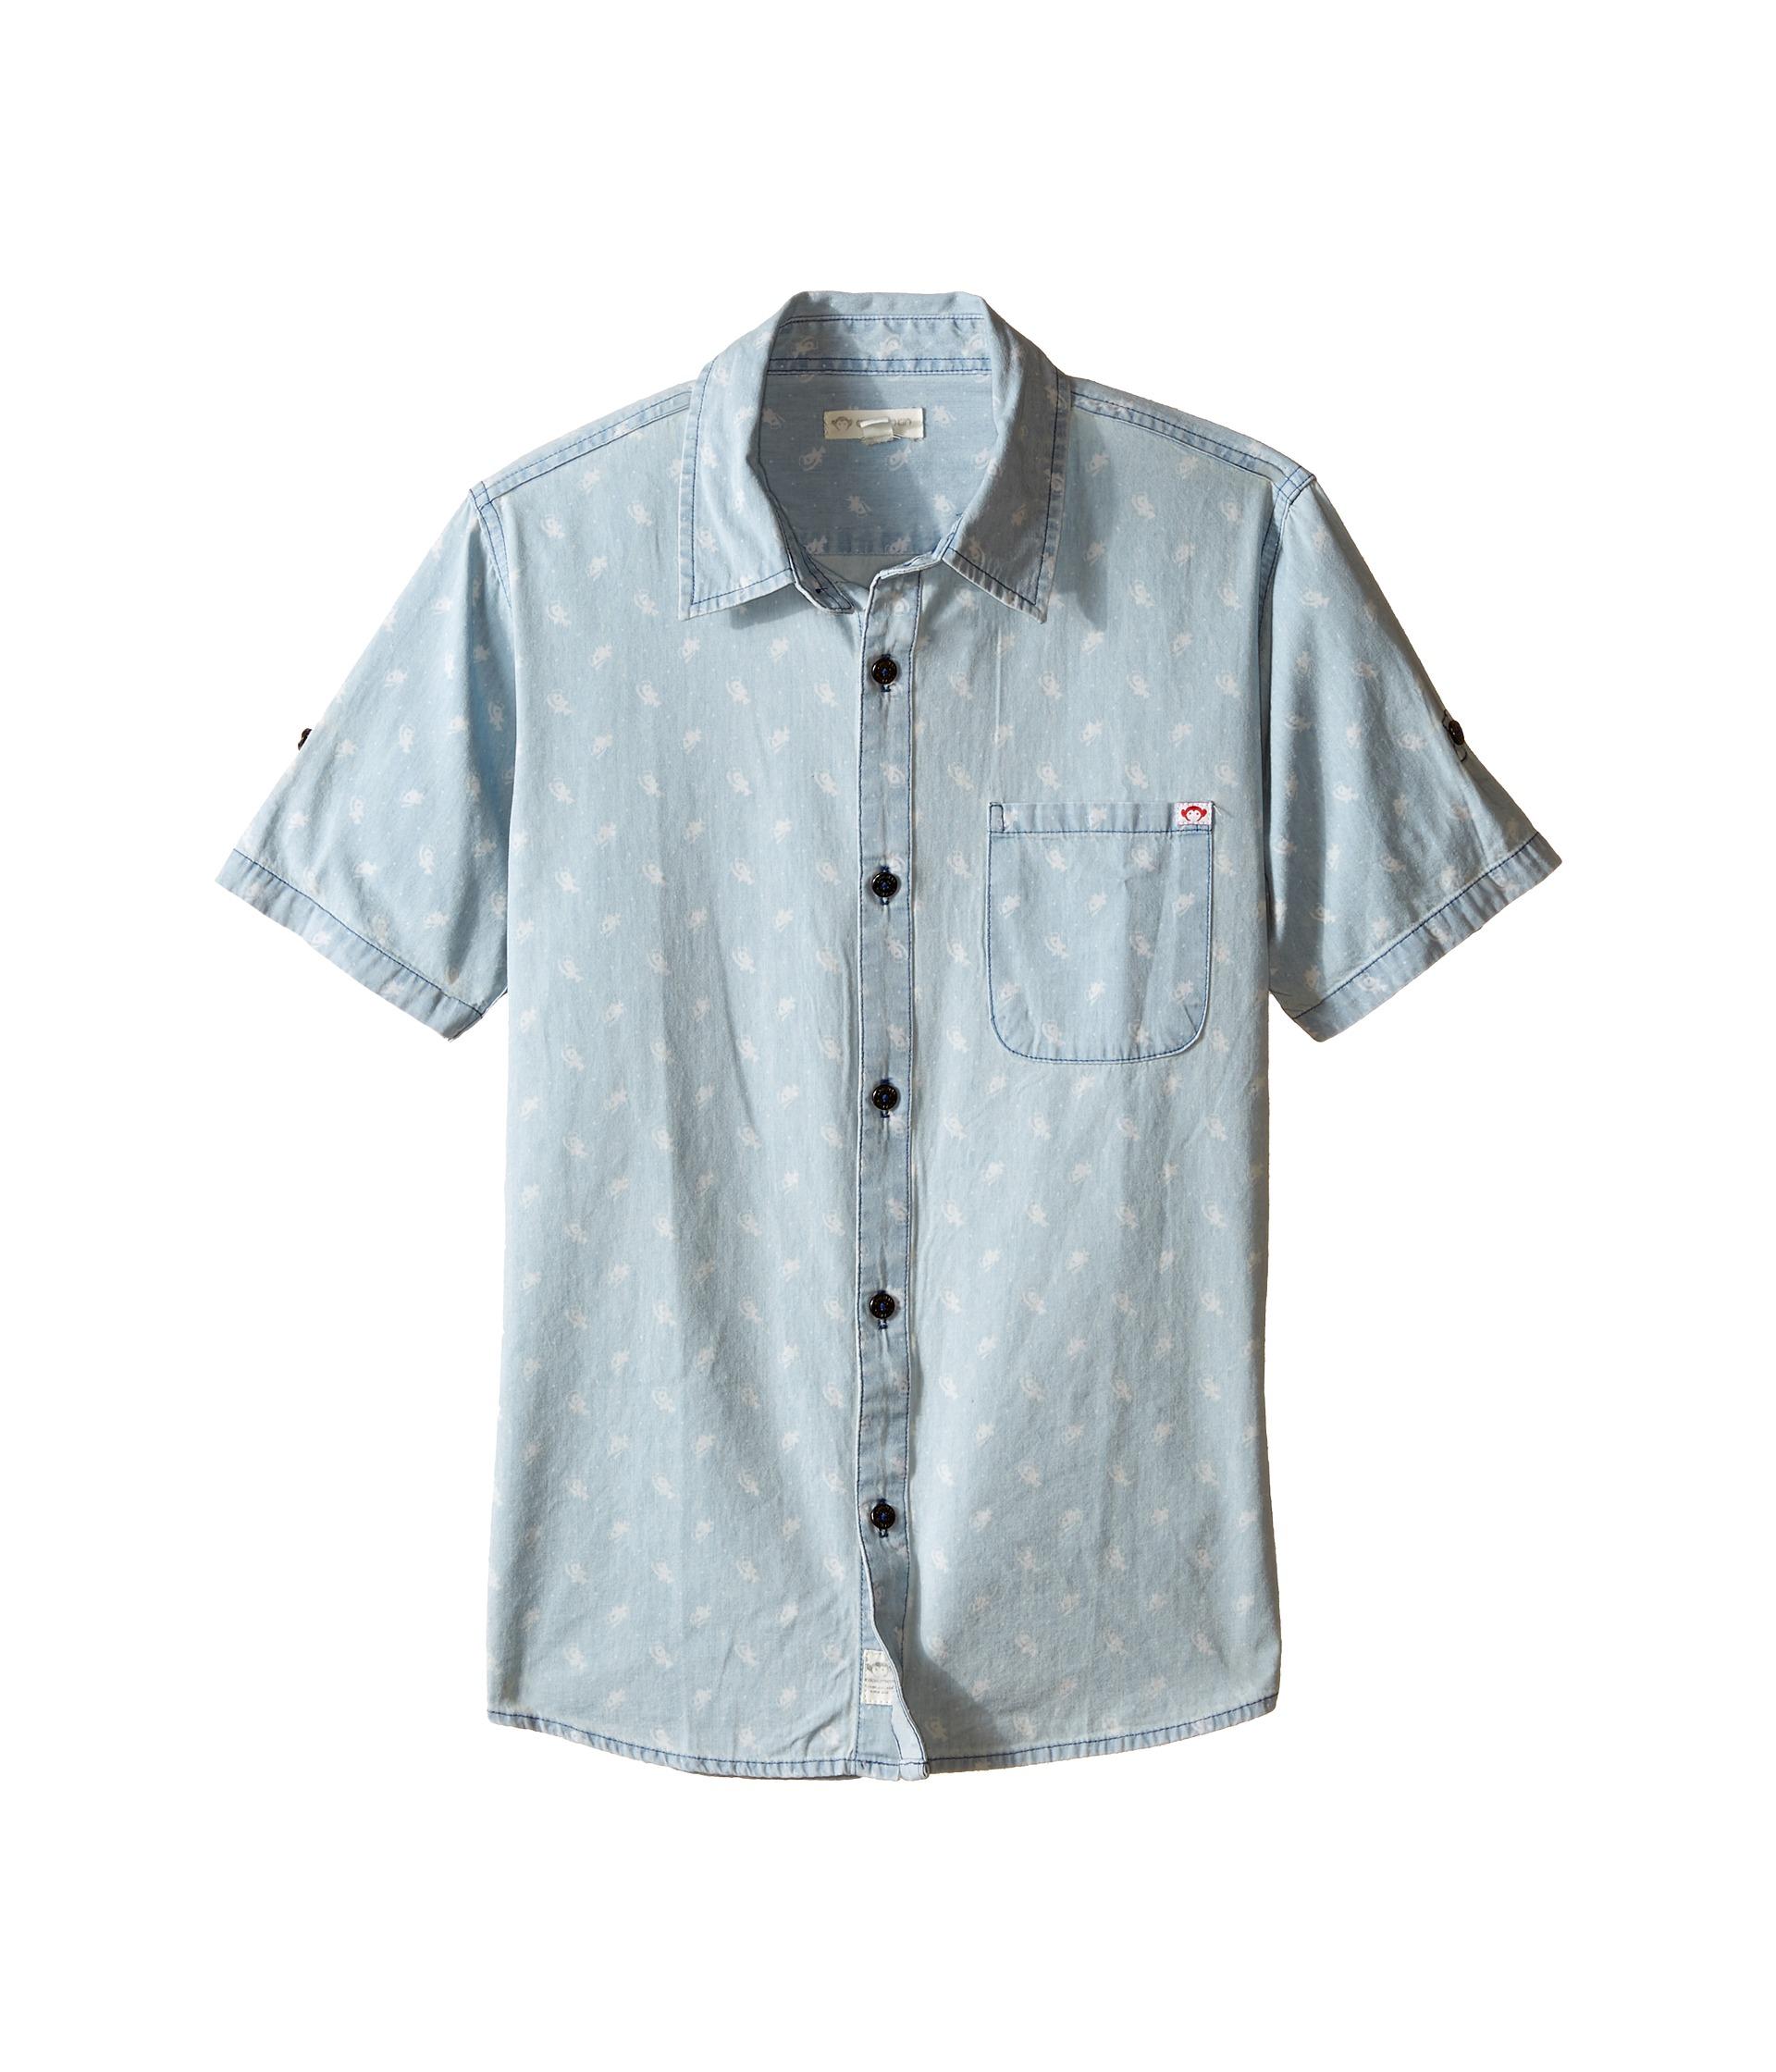 Appaman kids vintage inspired button up shirt with angler for Fish print shirt